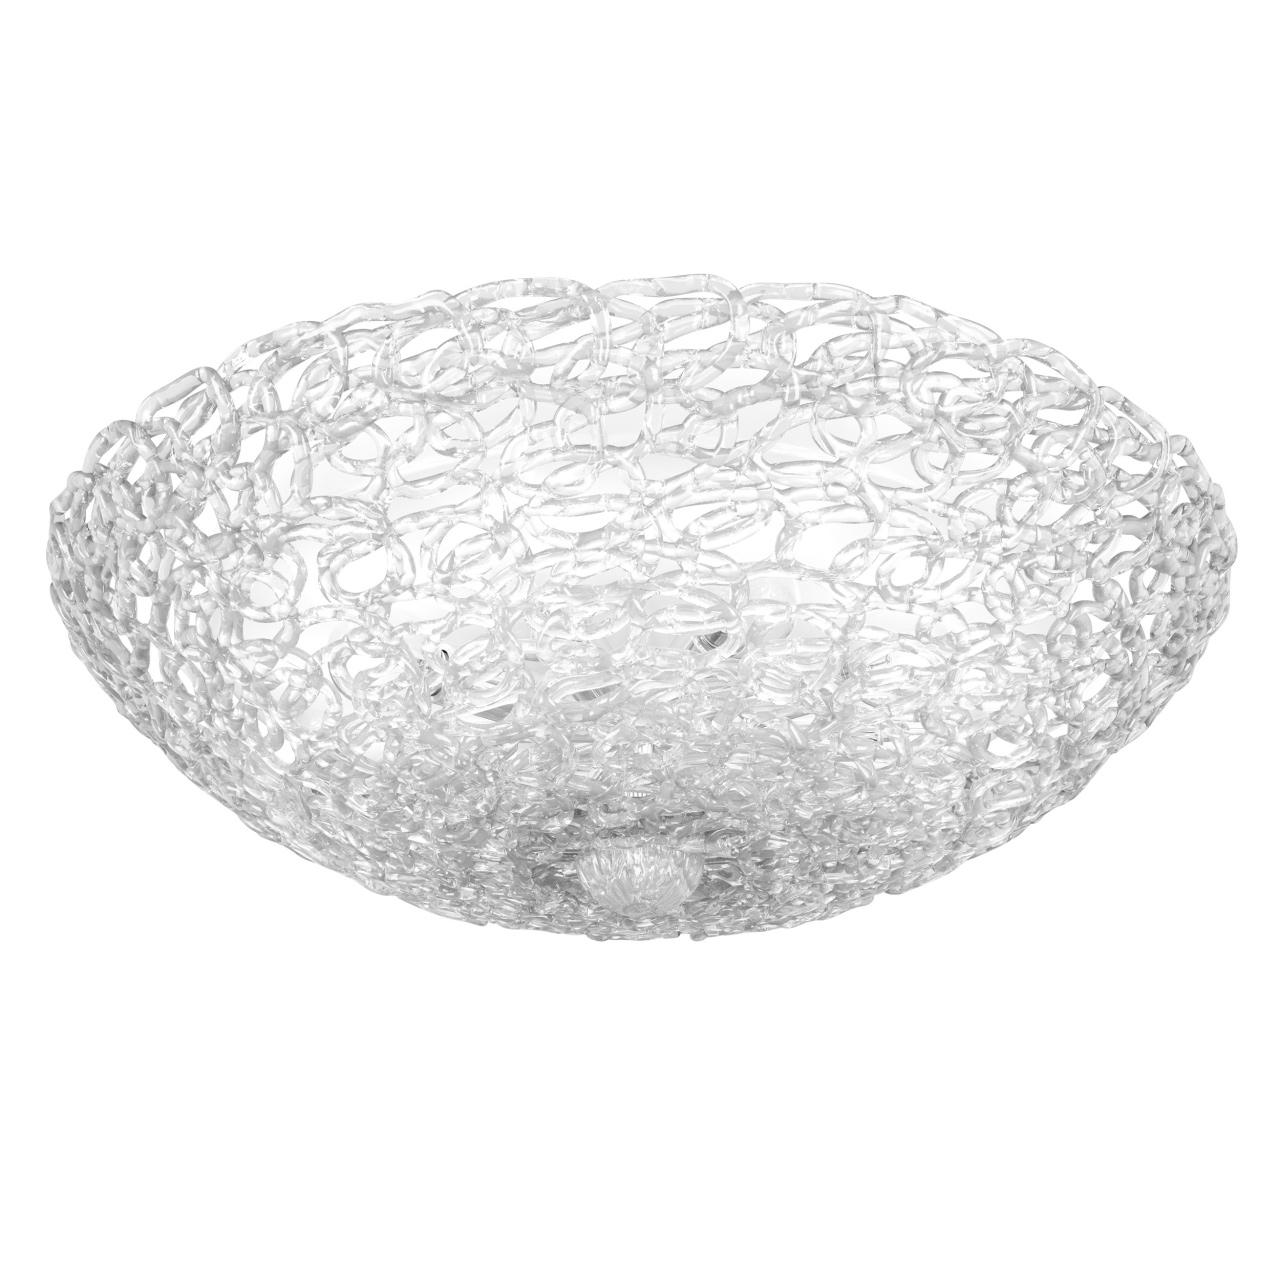 Люстра потолочная Lightstar 603100 Murano